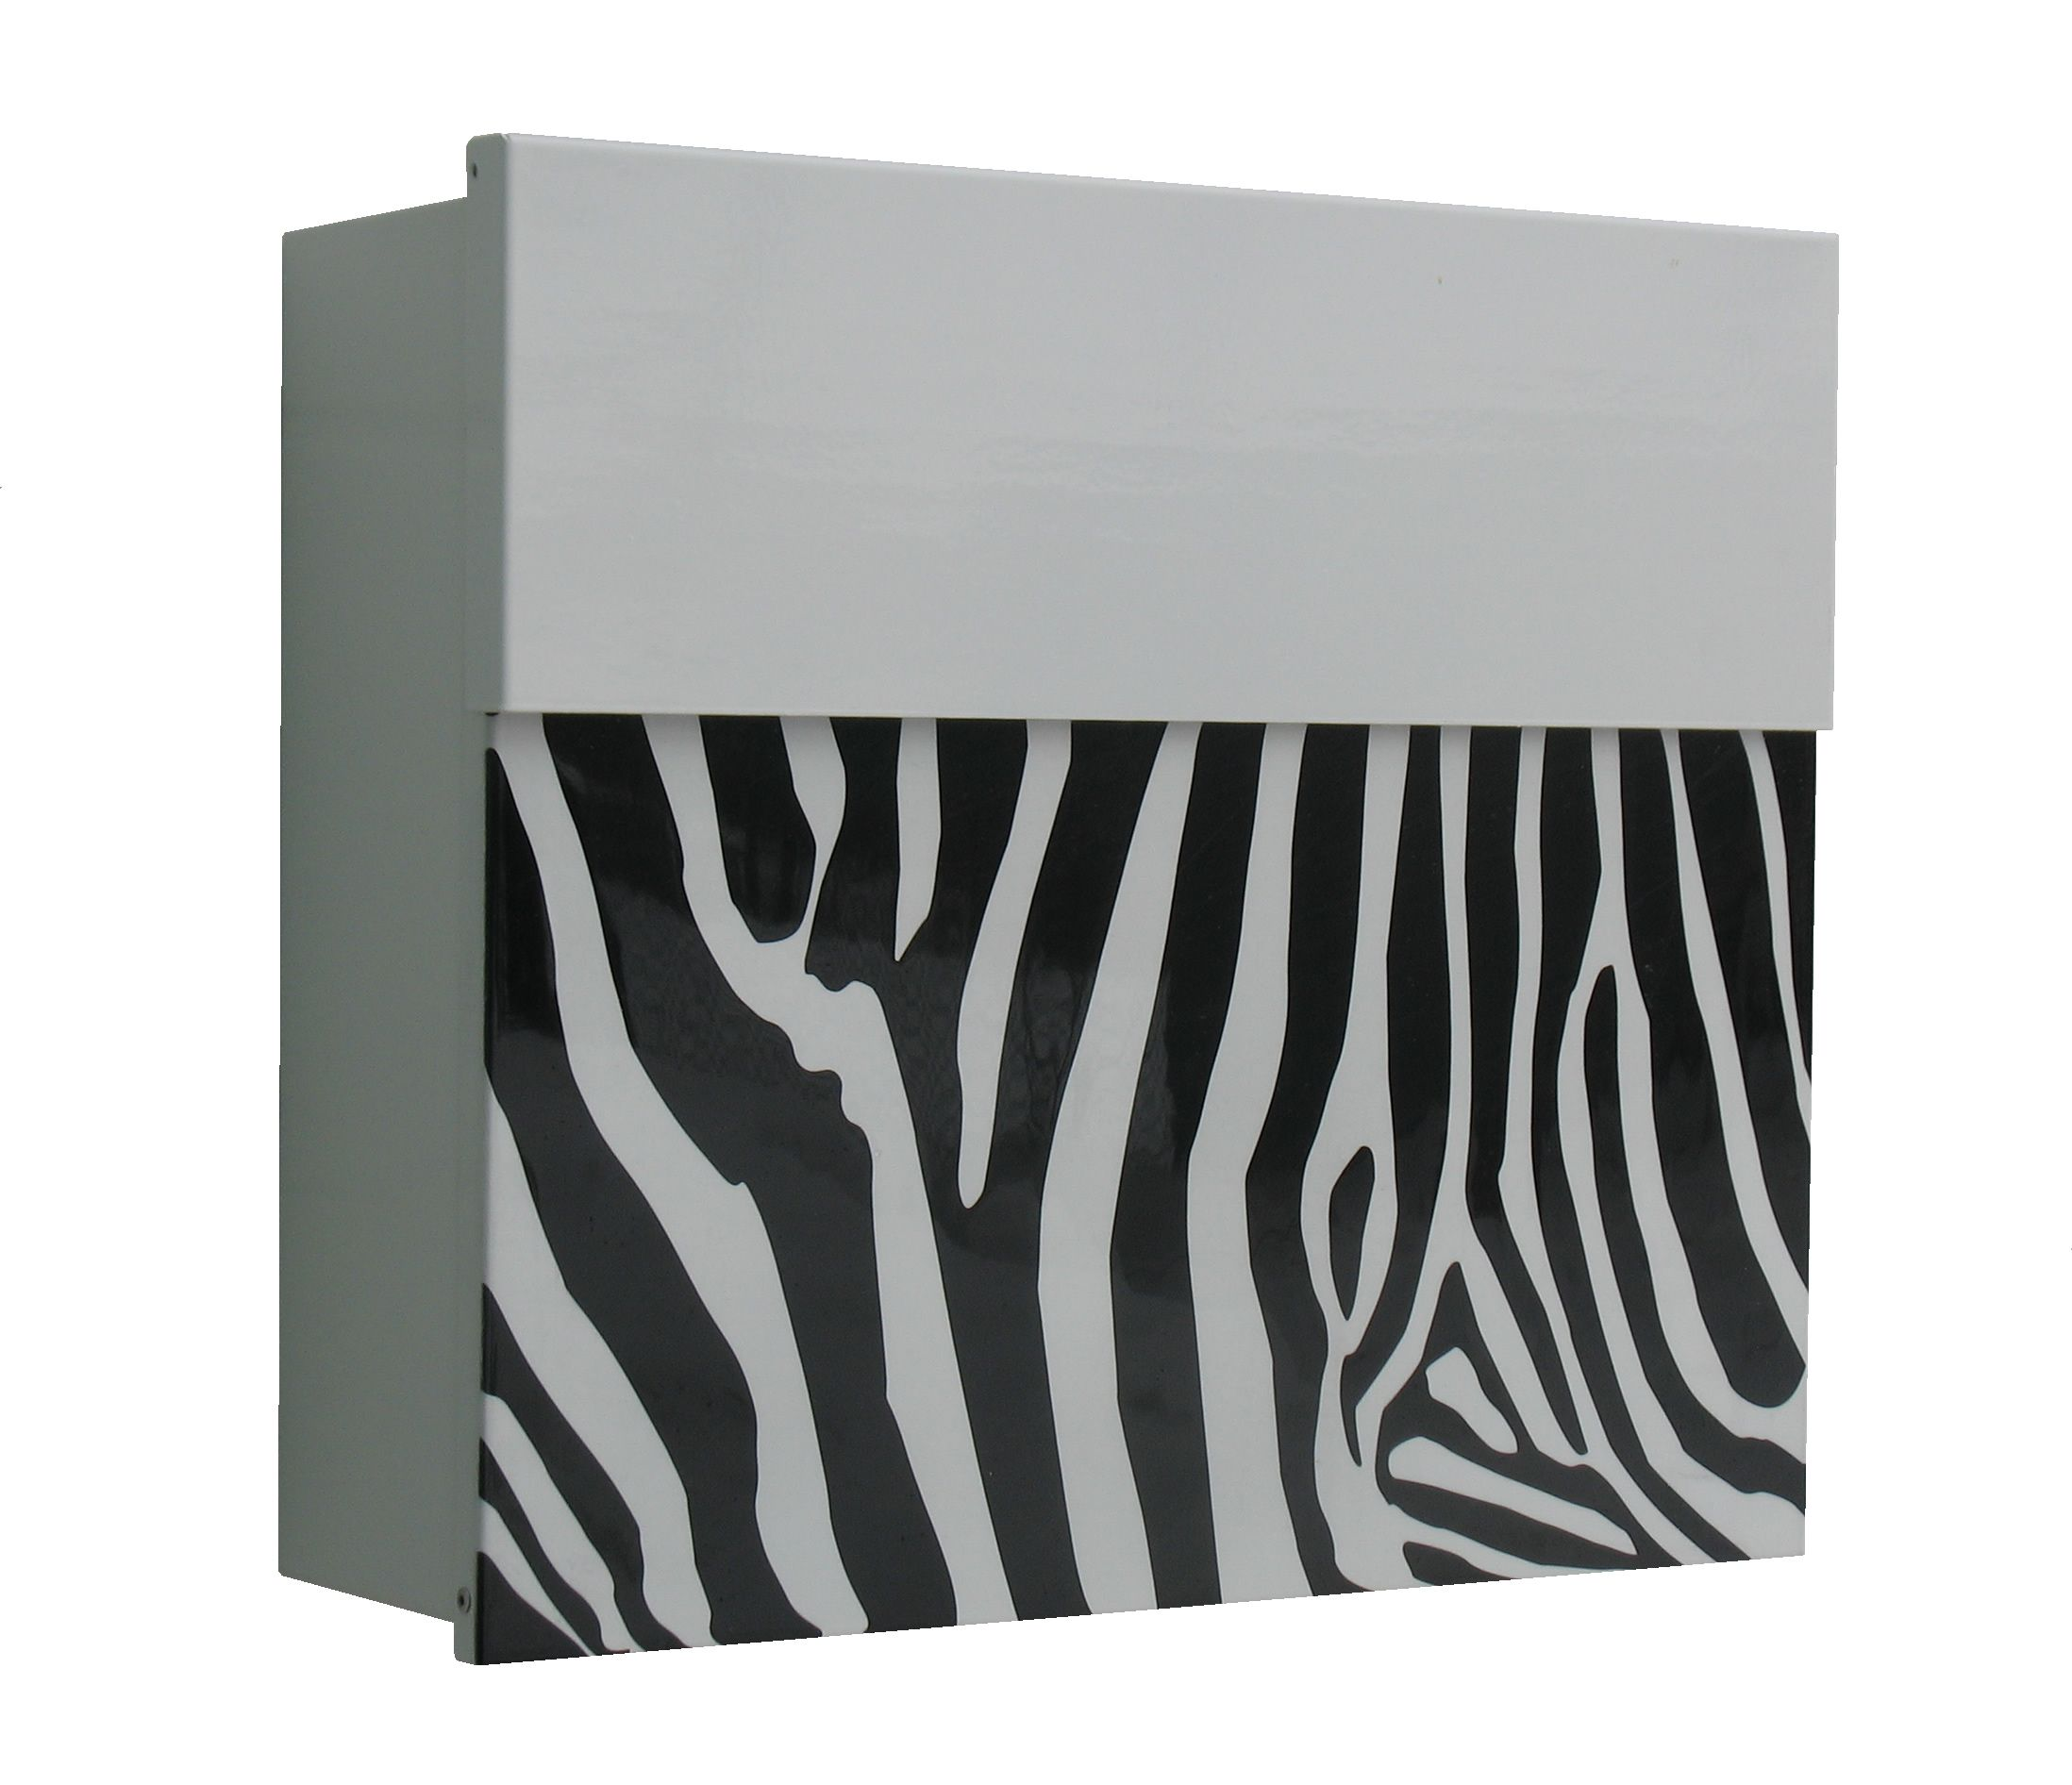 White Zebra Mailbox Mailbox Design Modern Mailbox Modern Mailbox Design